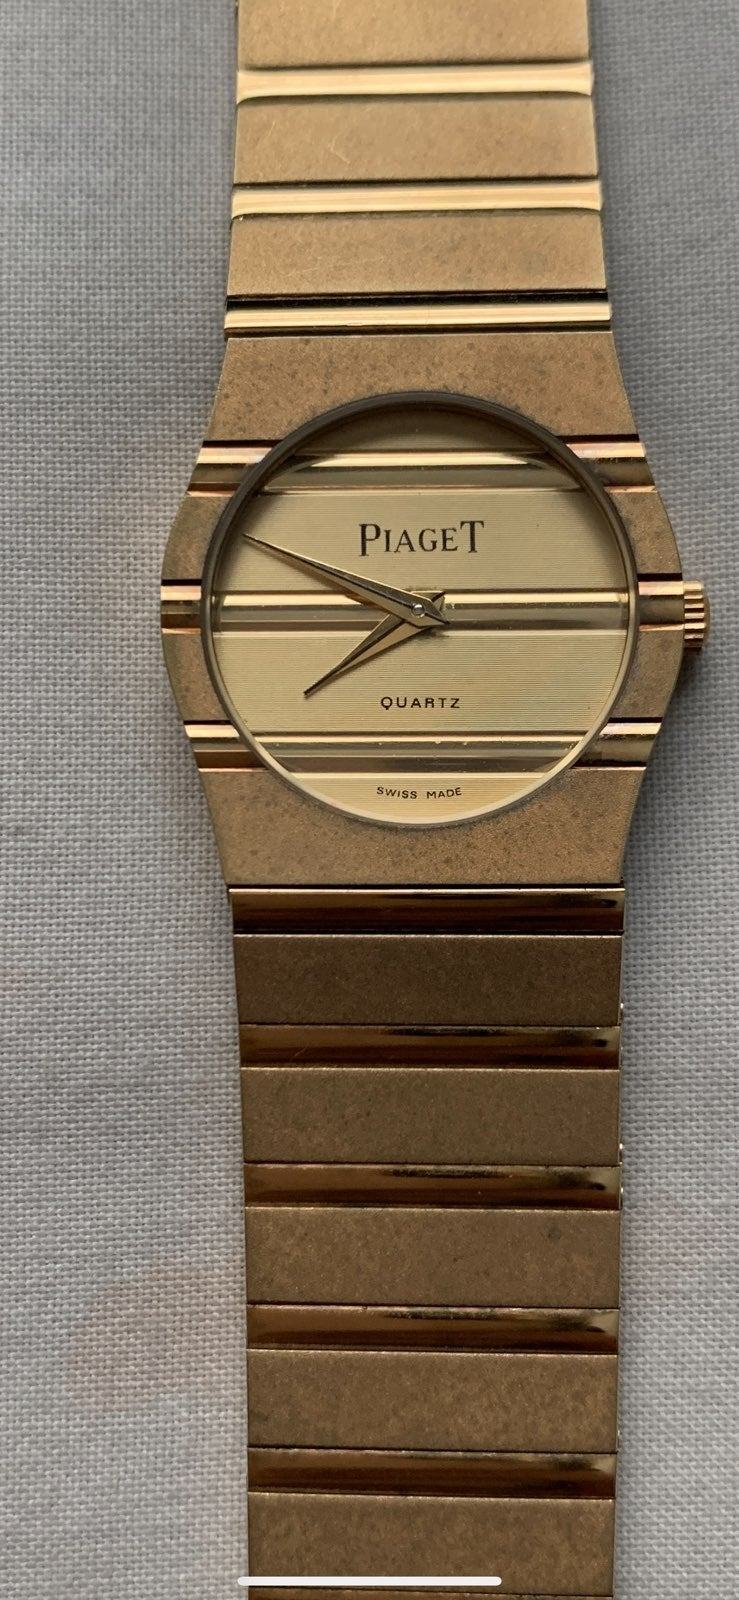 Vintage Piaget Watch